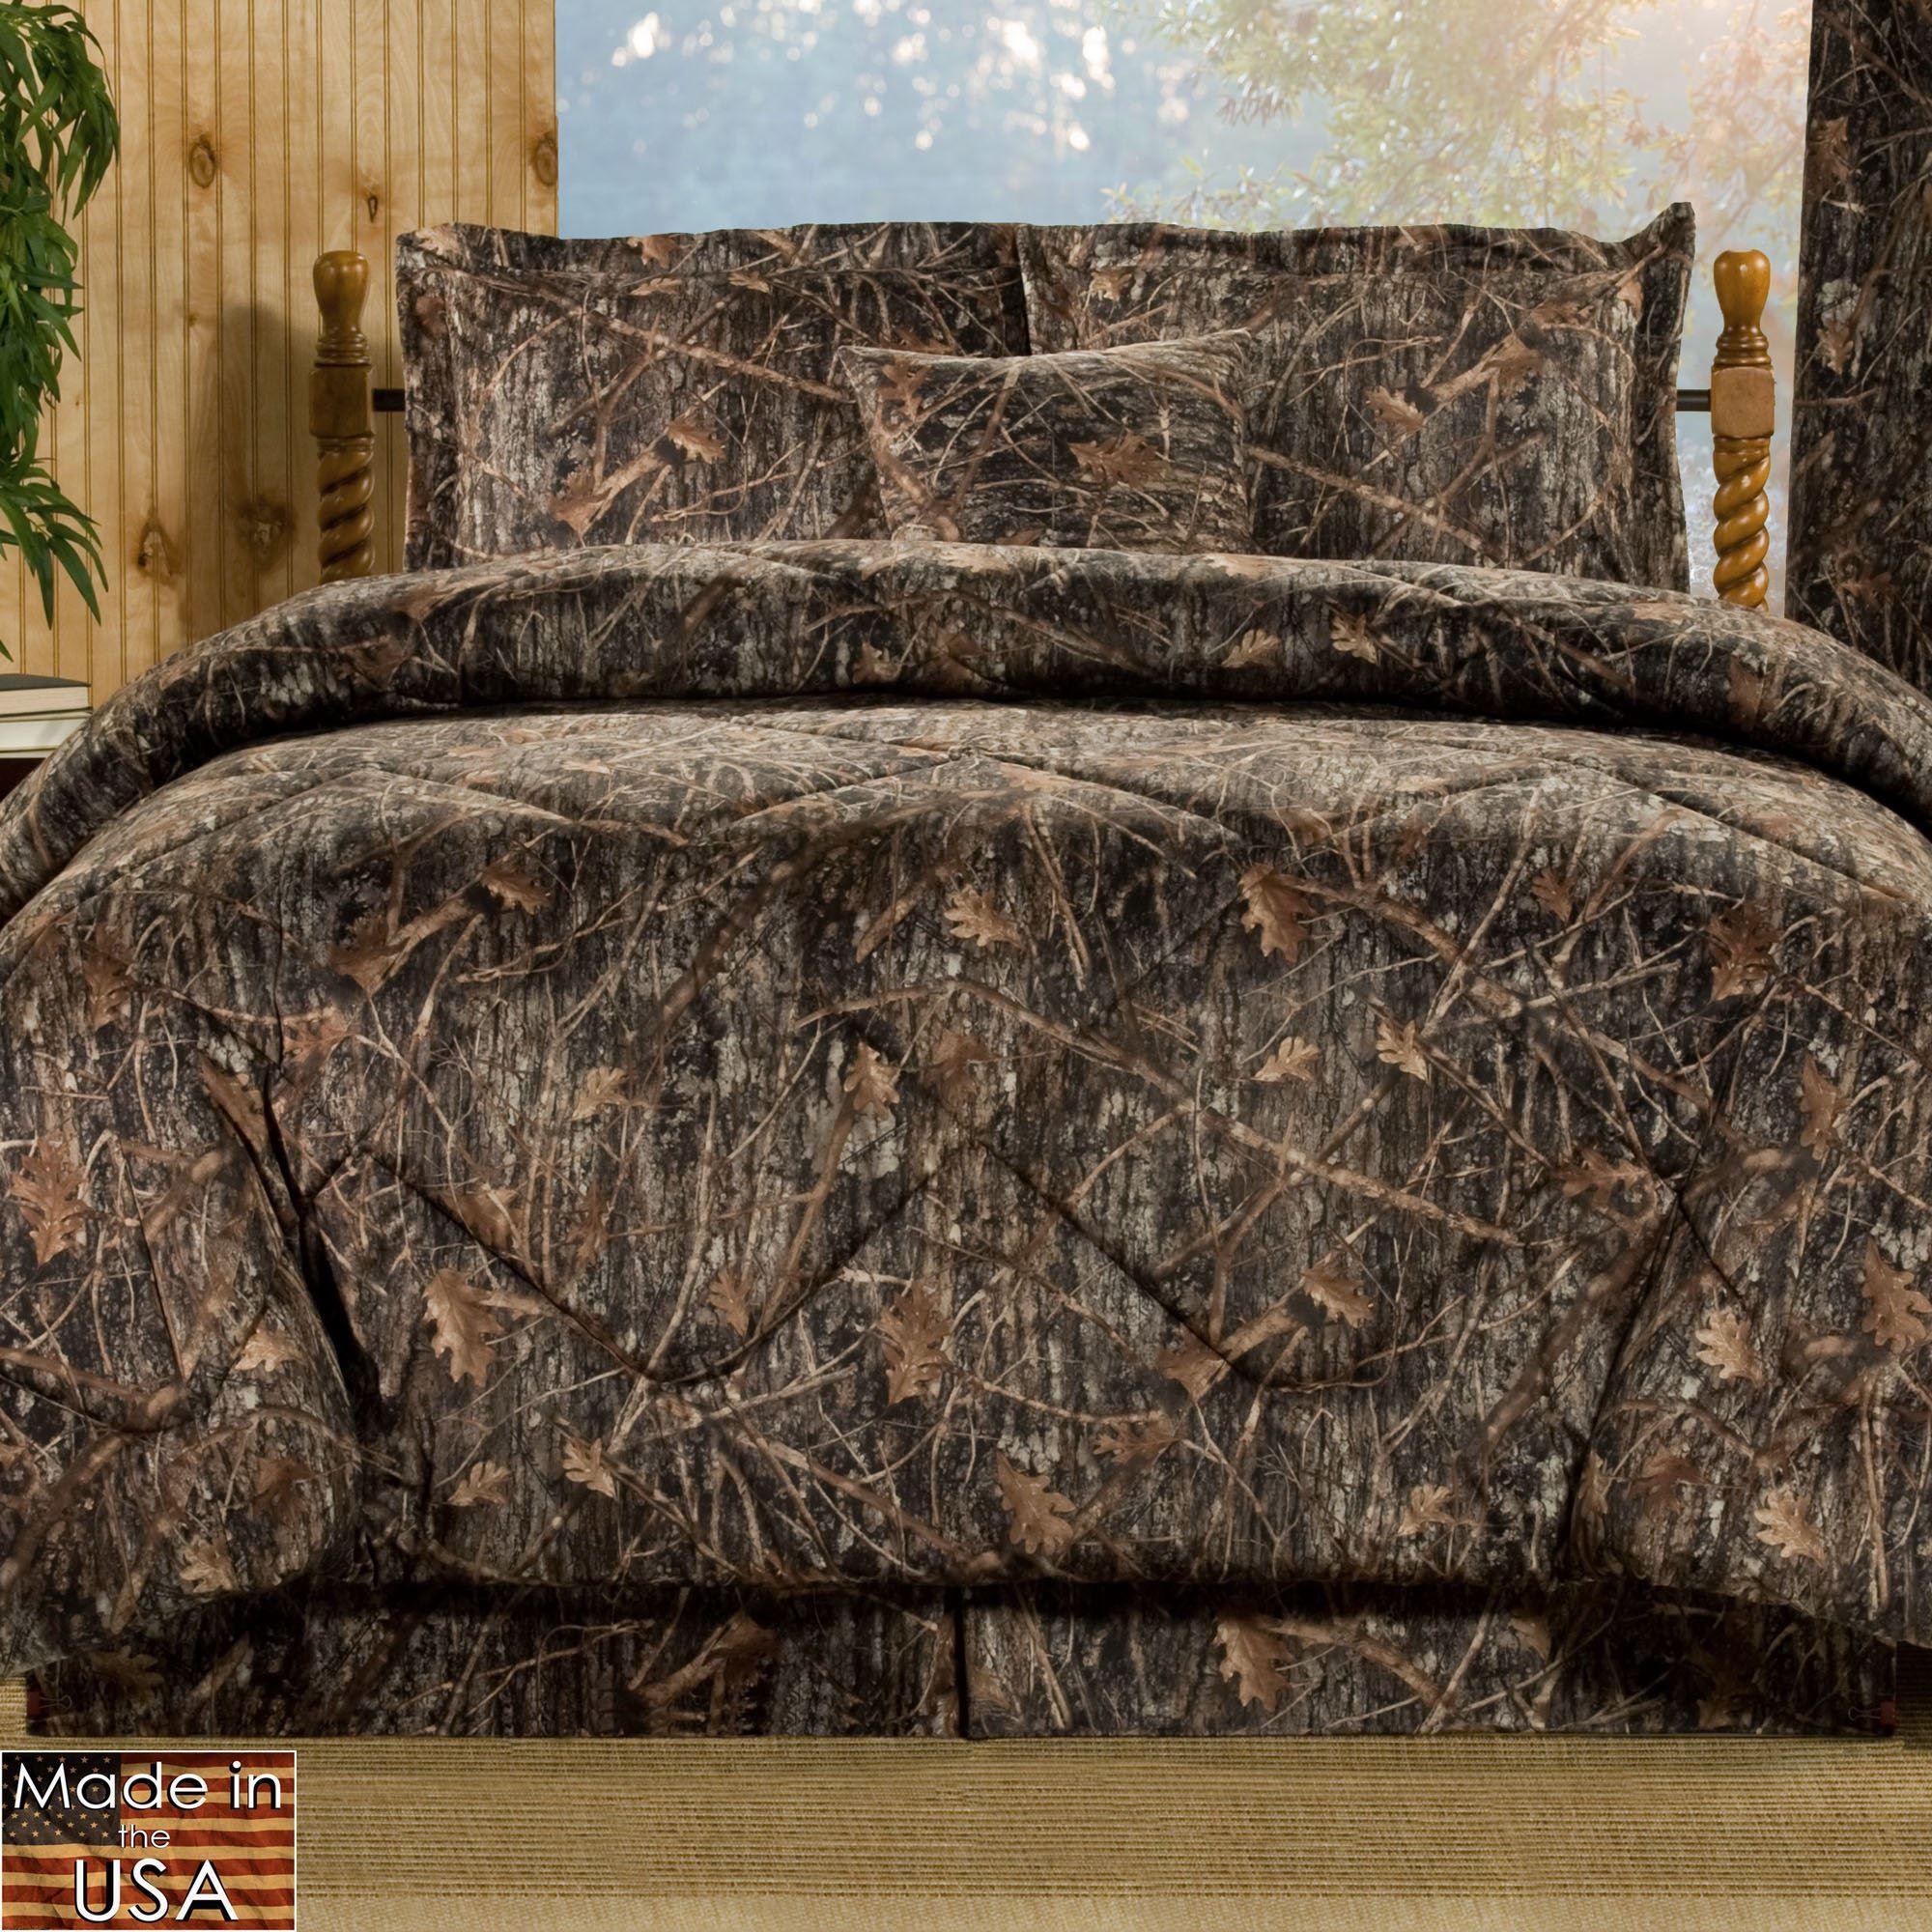 Conceal Brown Rustic Camo Mini Comforter Set Bedding